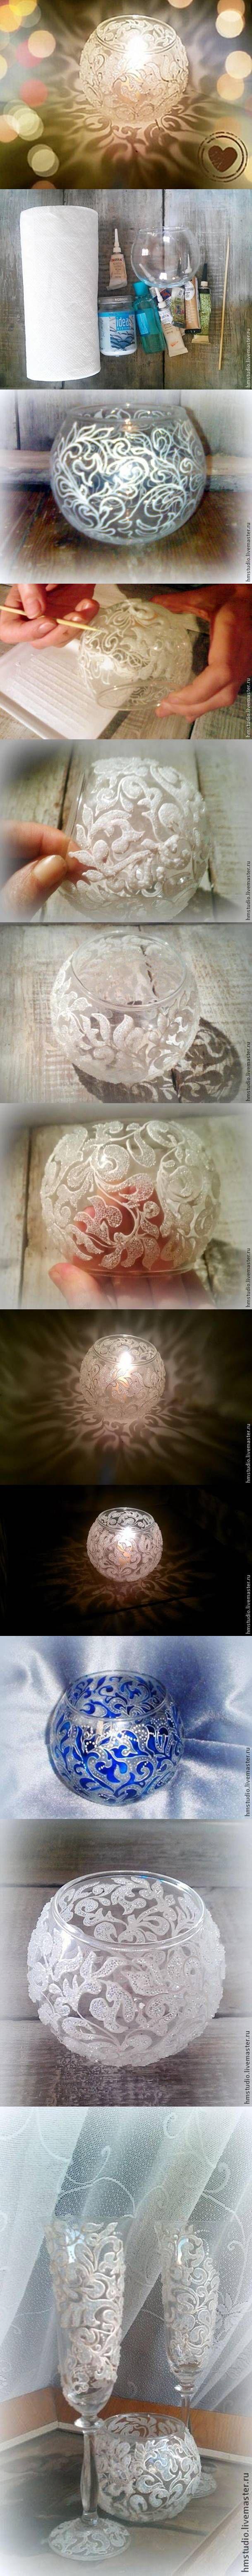 DIY Frosty Pattern Vase DIY Projects | UsefulDIY.com Follow Us on Facebook ==> http://www.facebook.com/UsefulDiy